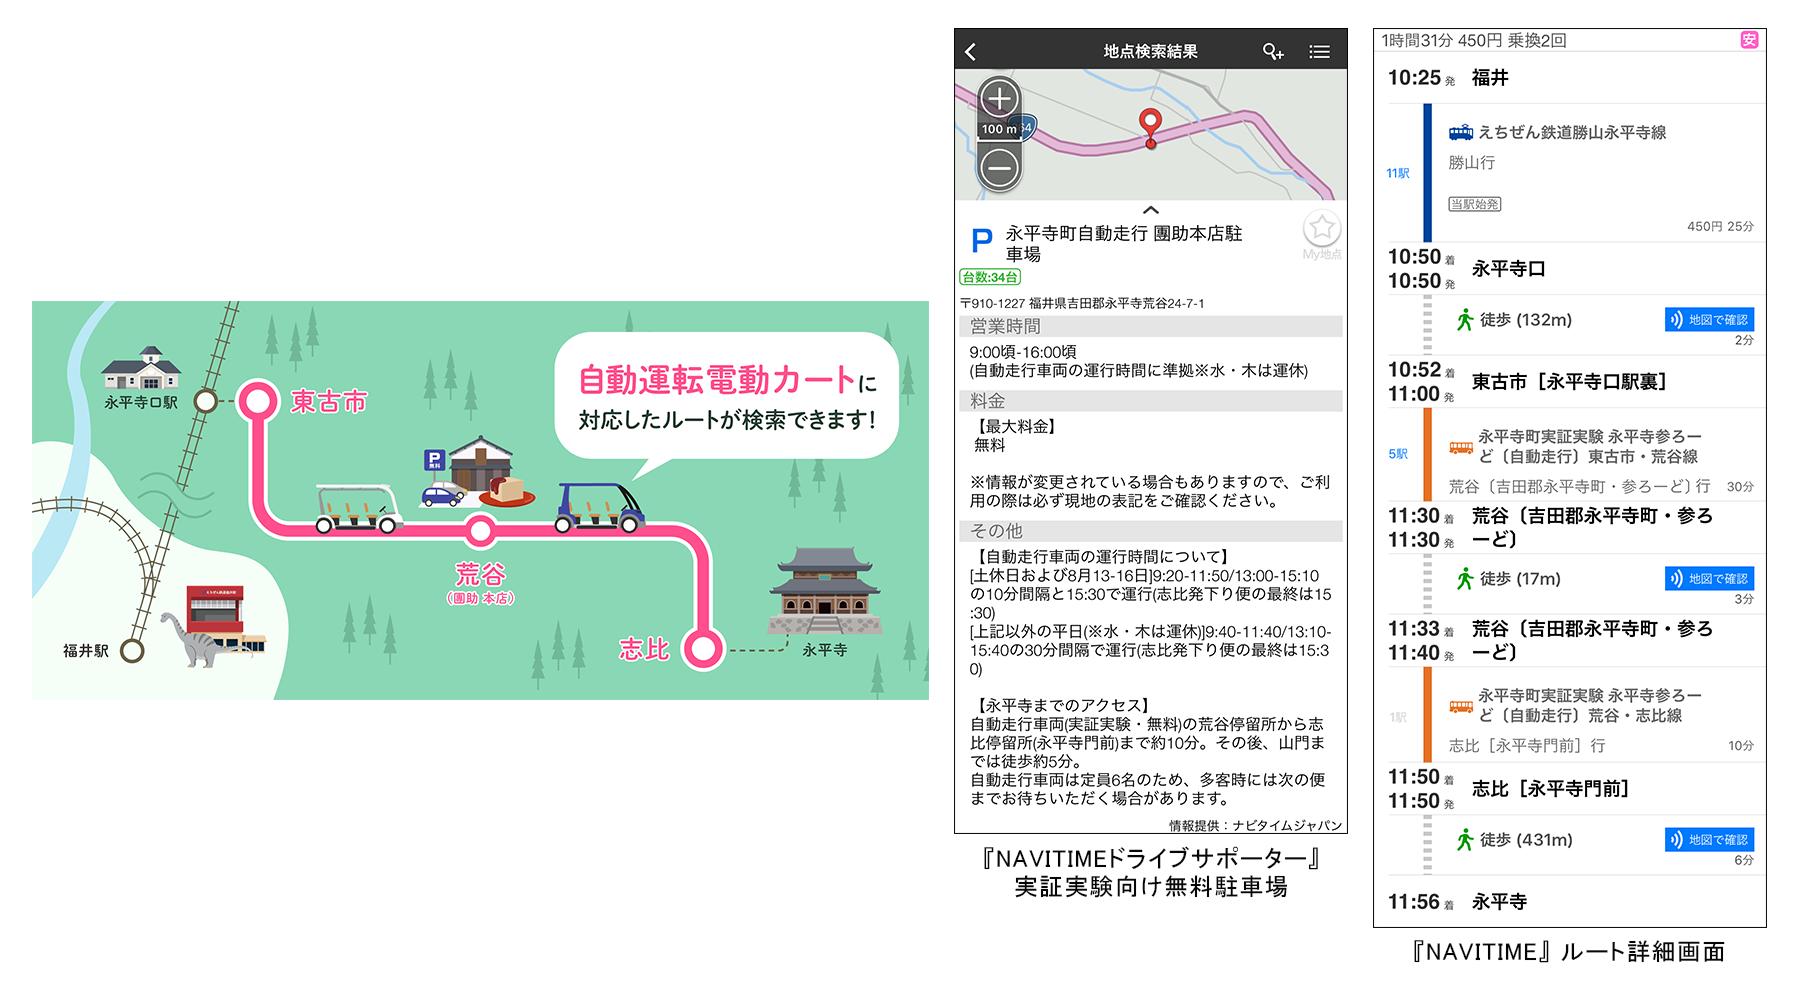 http://corporate.navitime.co.jp/topics/c9342c42c038771e5704ea653165f29979491895.png